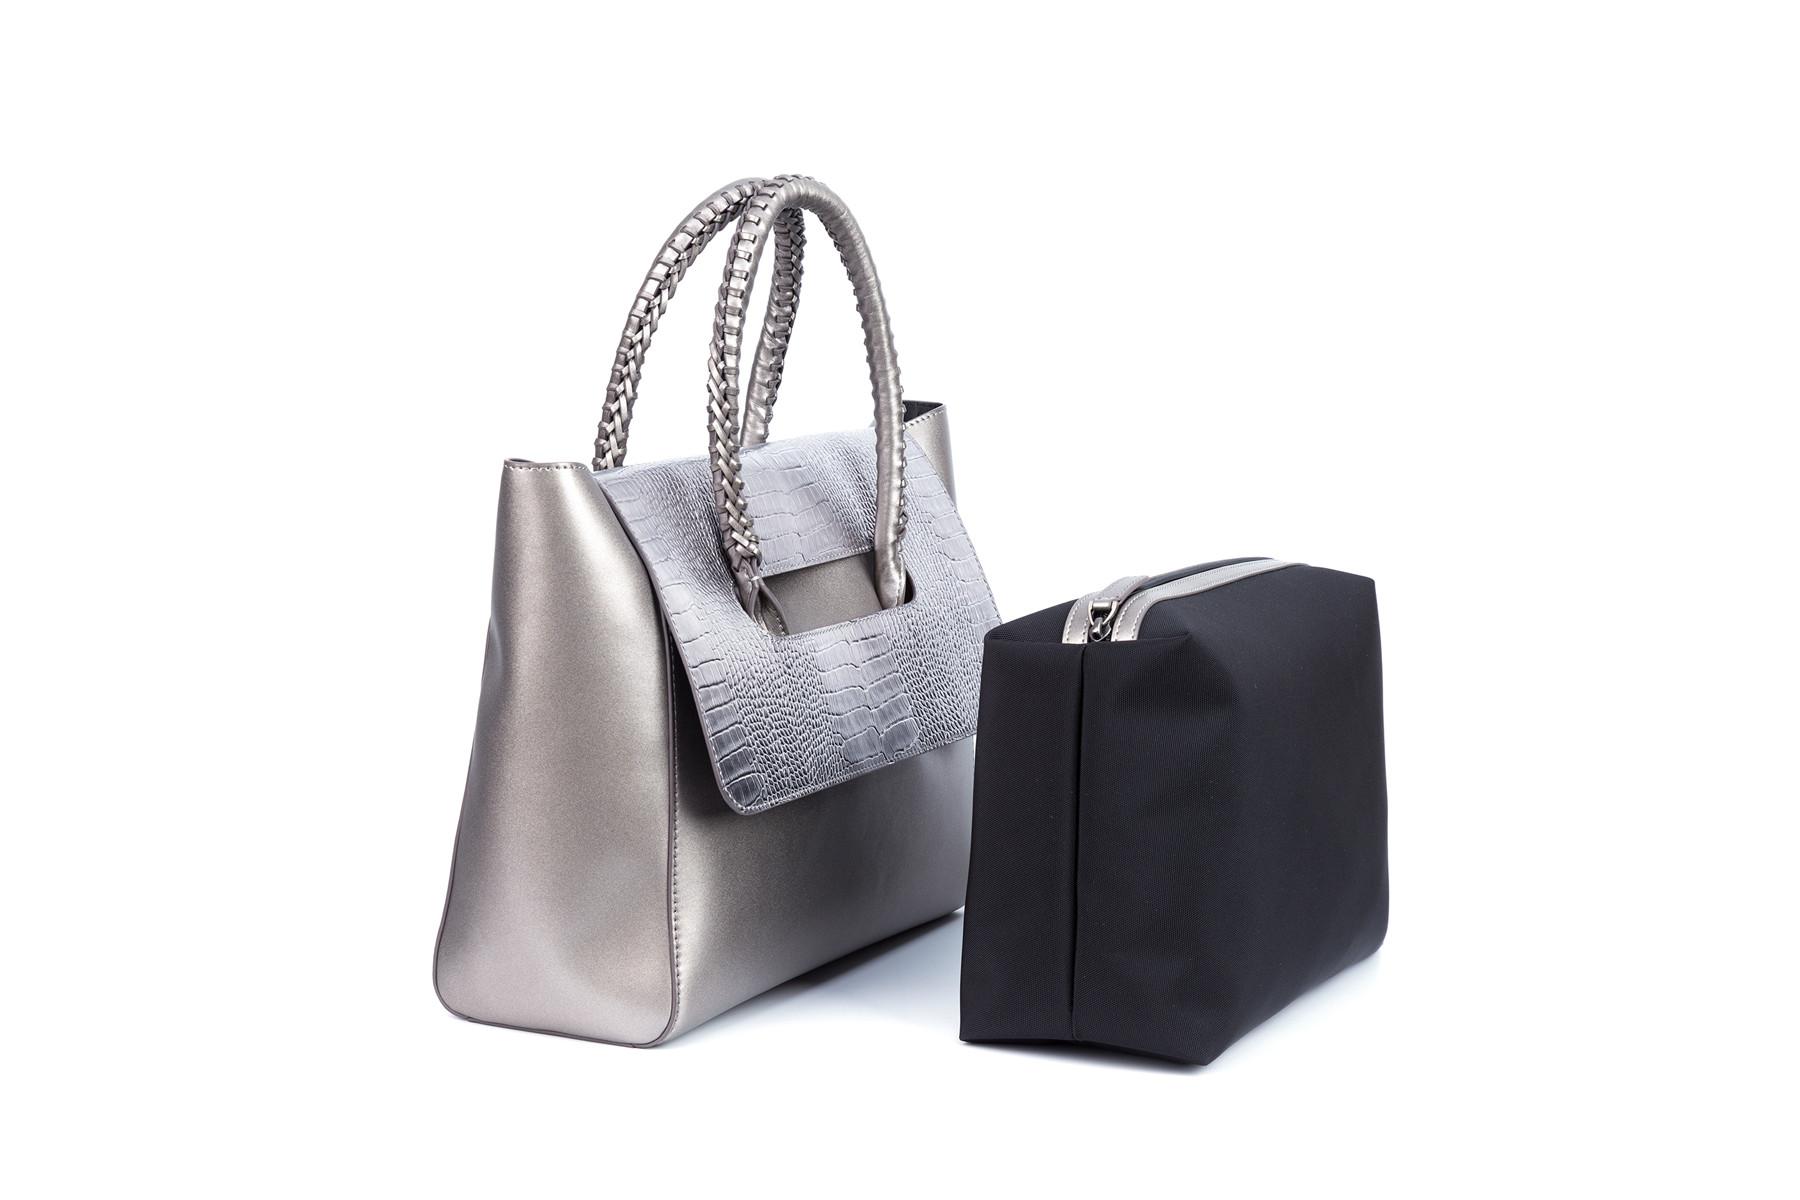 GF bags-Bulk Luxury Handbags Manufacturer, Affordable Handbags   Gf Bags-7